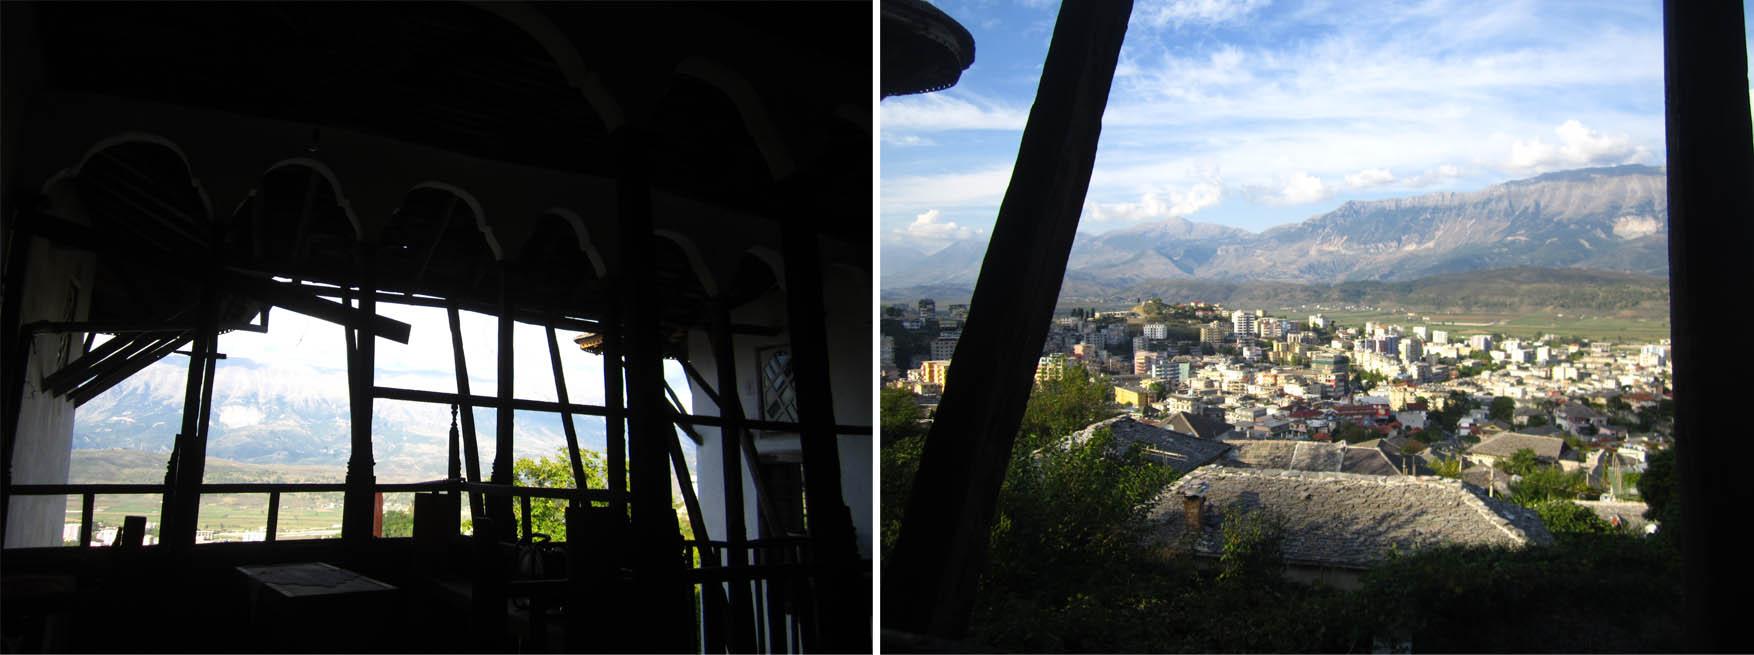 162 albanija gjirokastra skenduli kuca trem